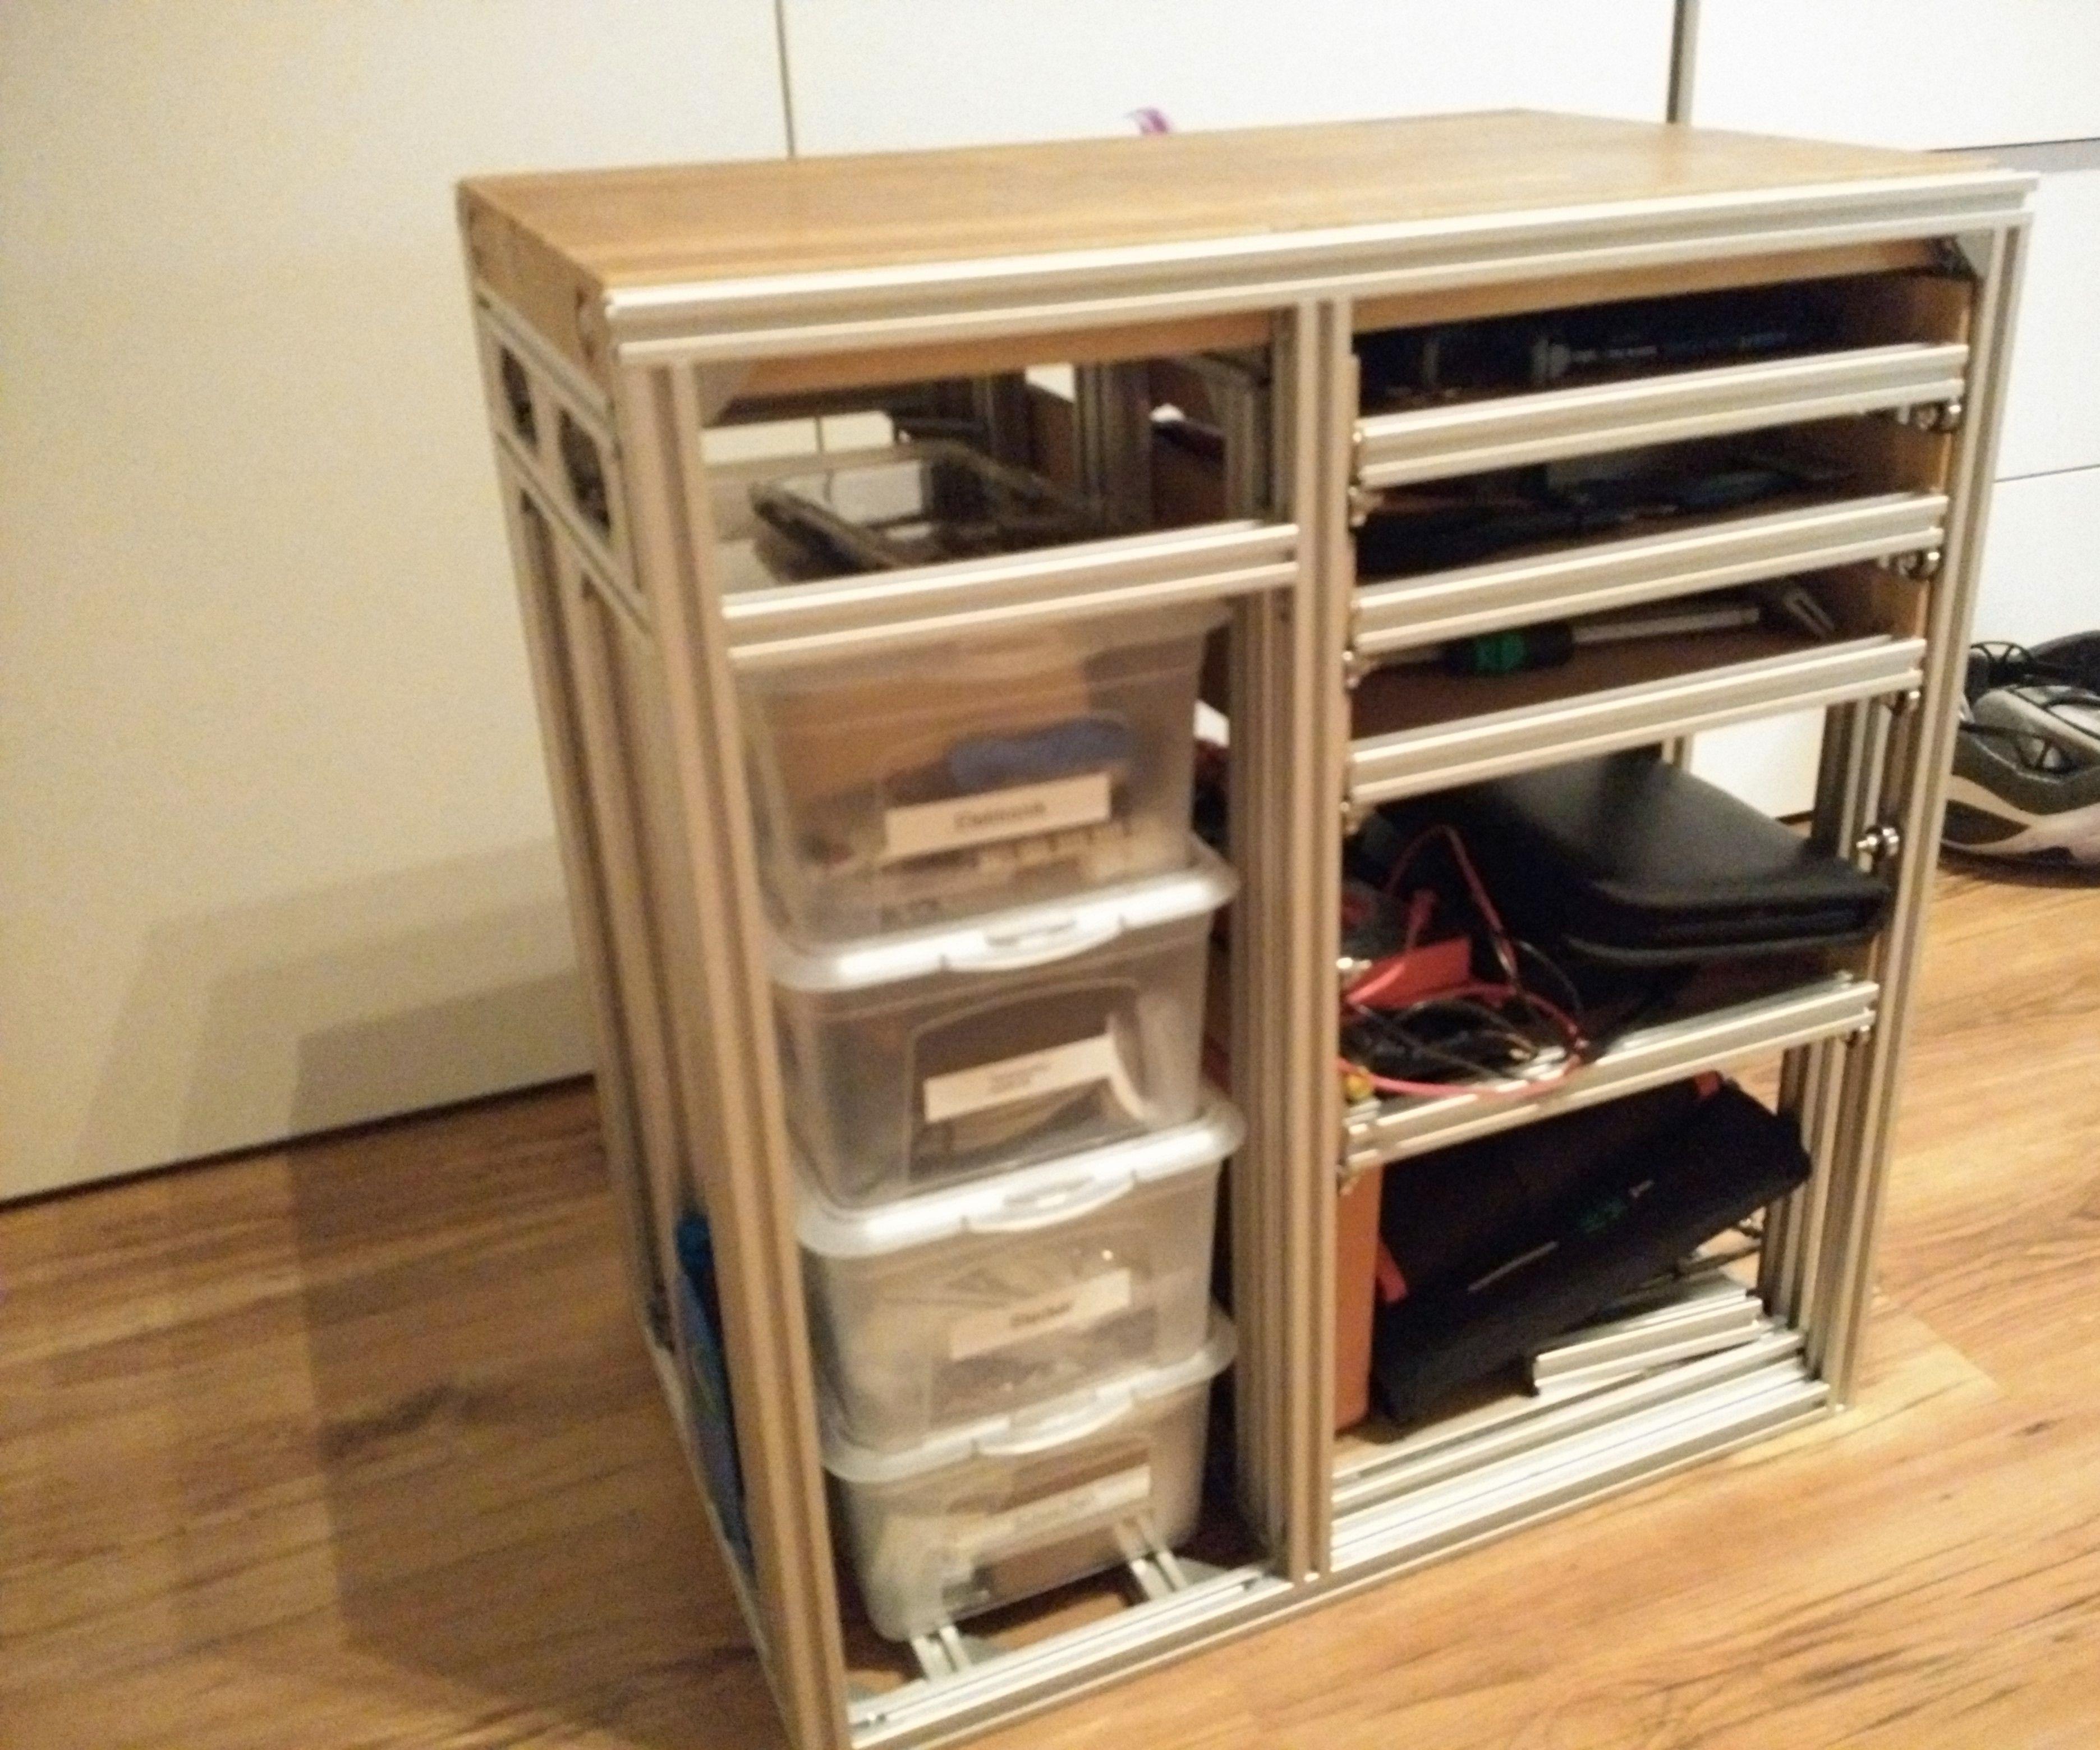 Complete workshop in a shelf